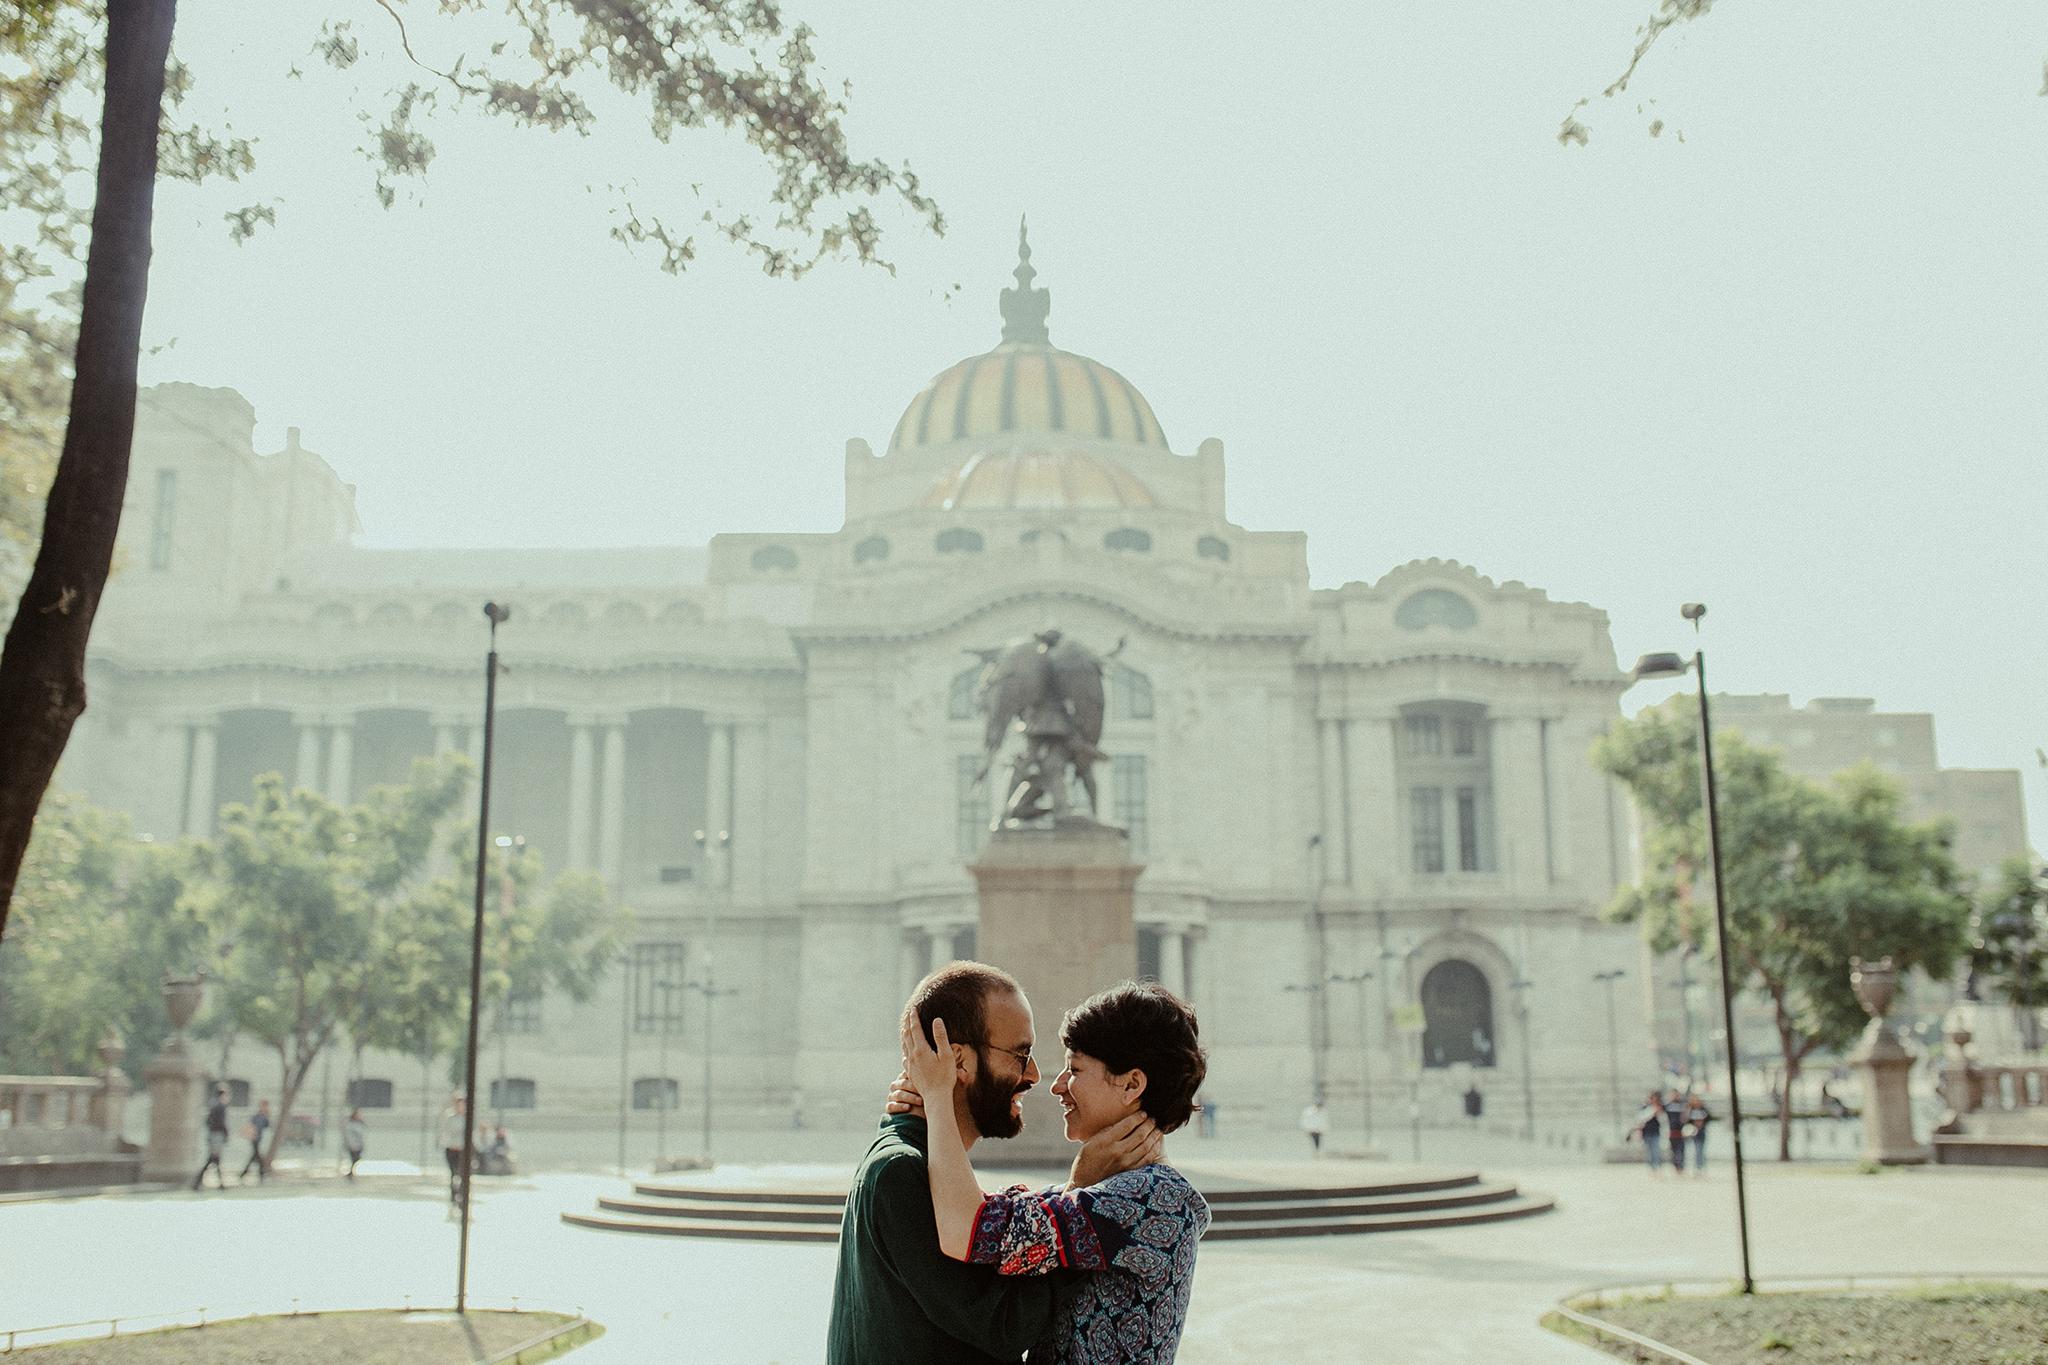 0035S_&_D_MexicoCity_CiudadDeMexico_WeddingDstination_MeridaYucatan_HaciendasMerida_BodasMexico_BodasYucatan_Boda_Destino.jpg